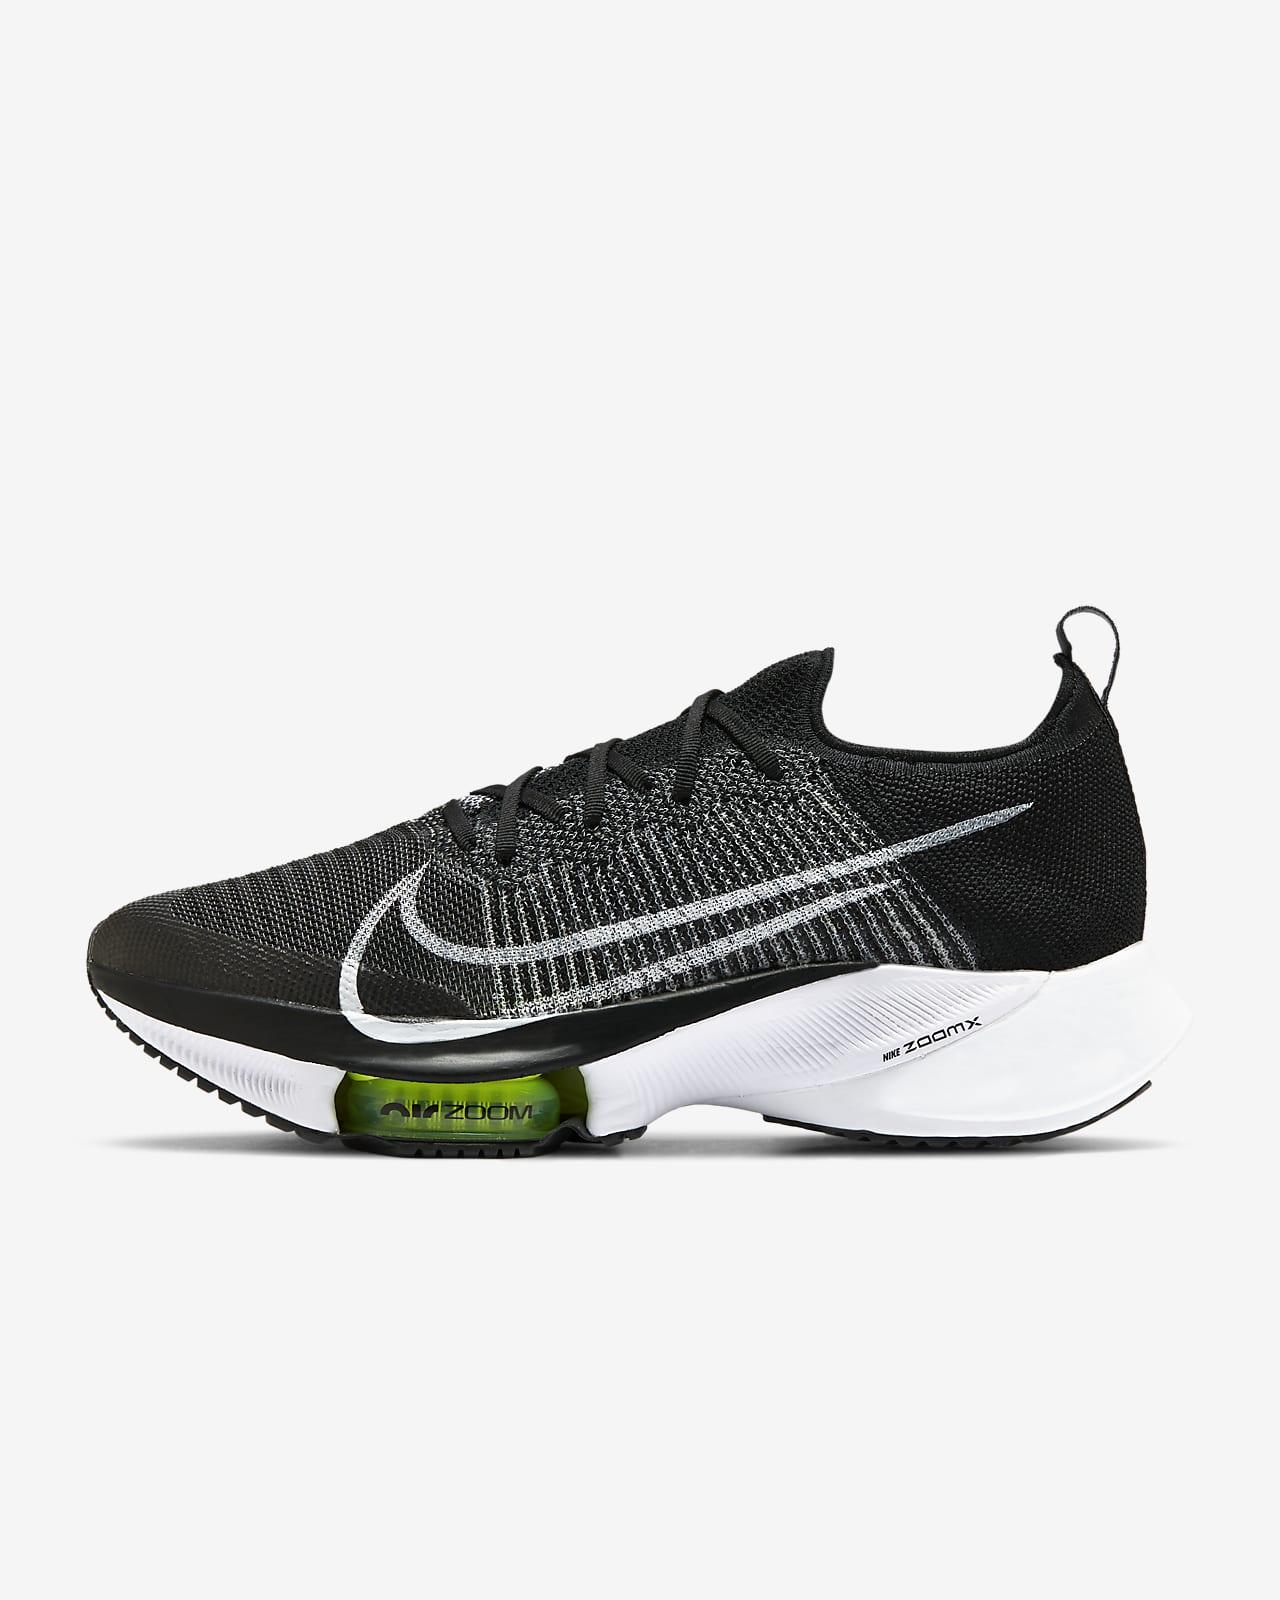 Мужские беговые кроссовки Nike Air Zoom Tempo NEXT%